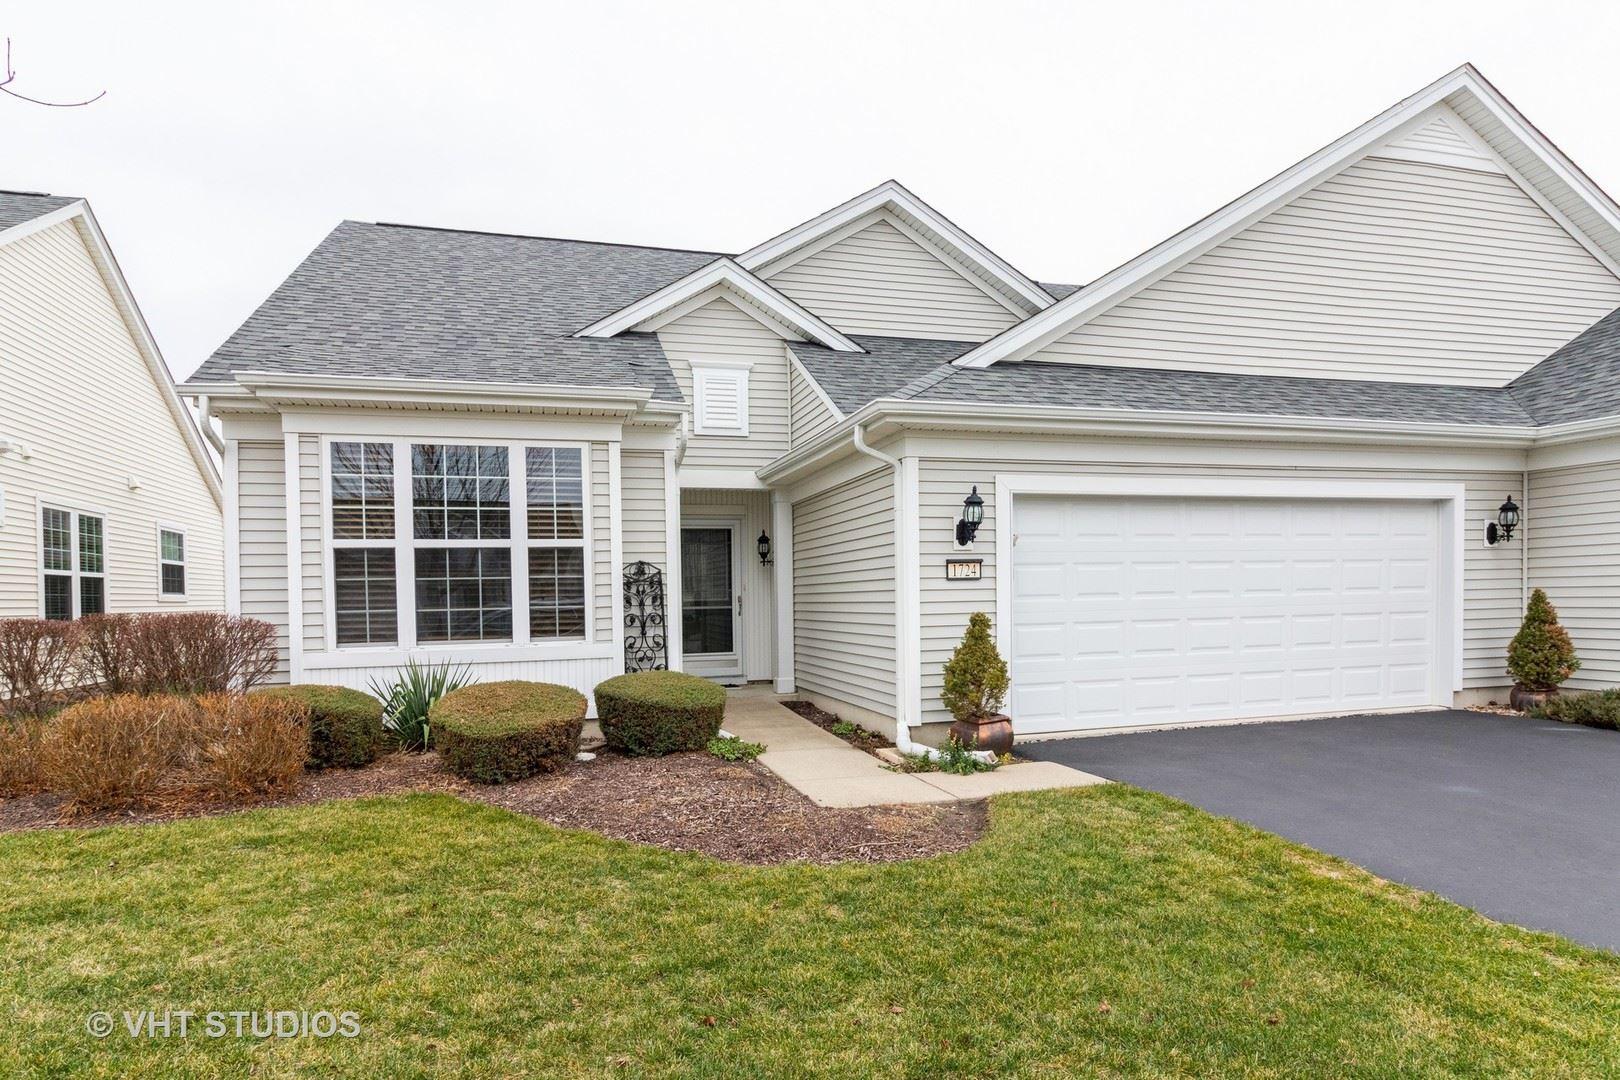 Photo of 1724 VANTAGE Drive, Shorewood, IL 60404 (MLS # 10946318)